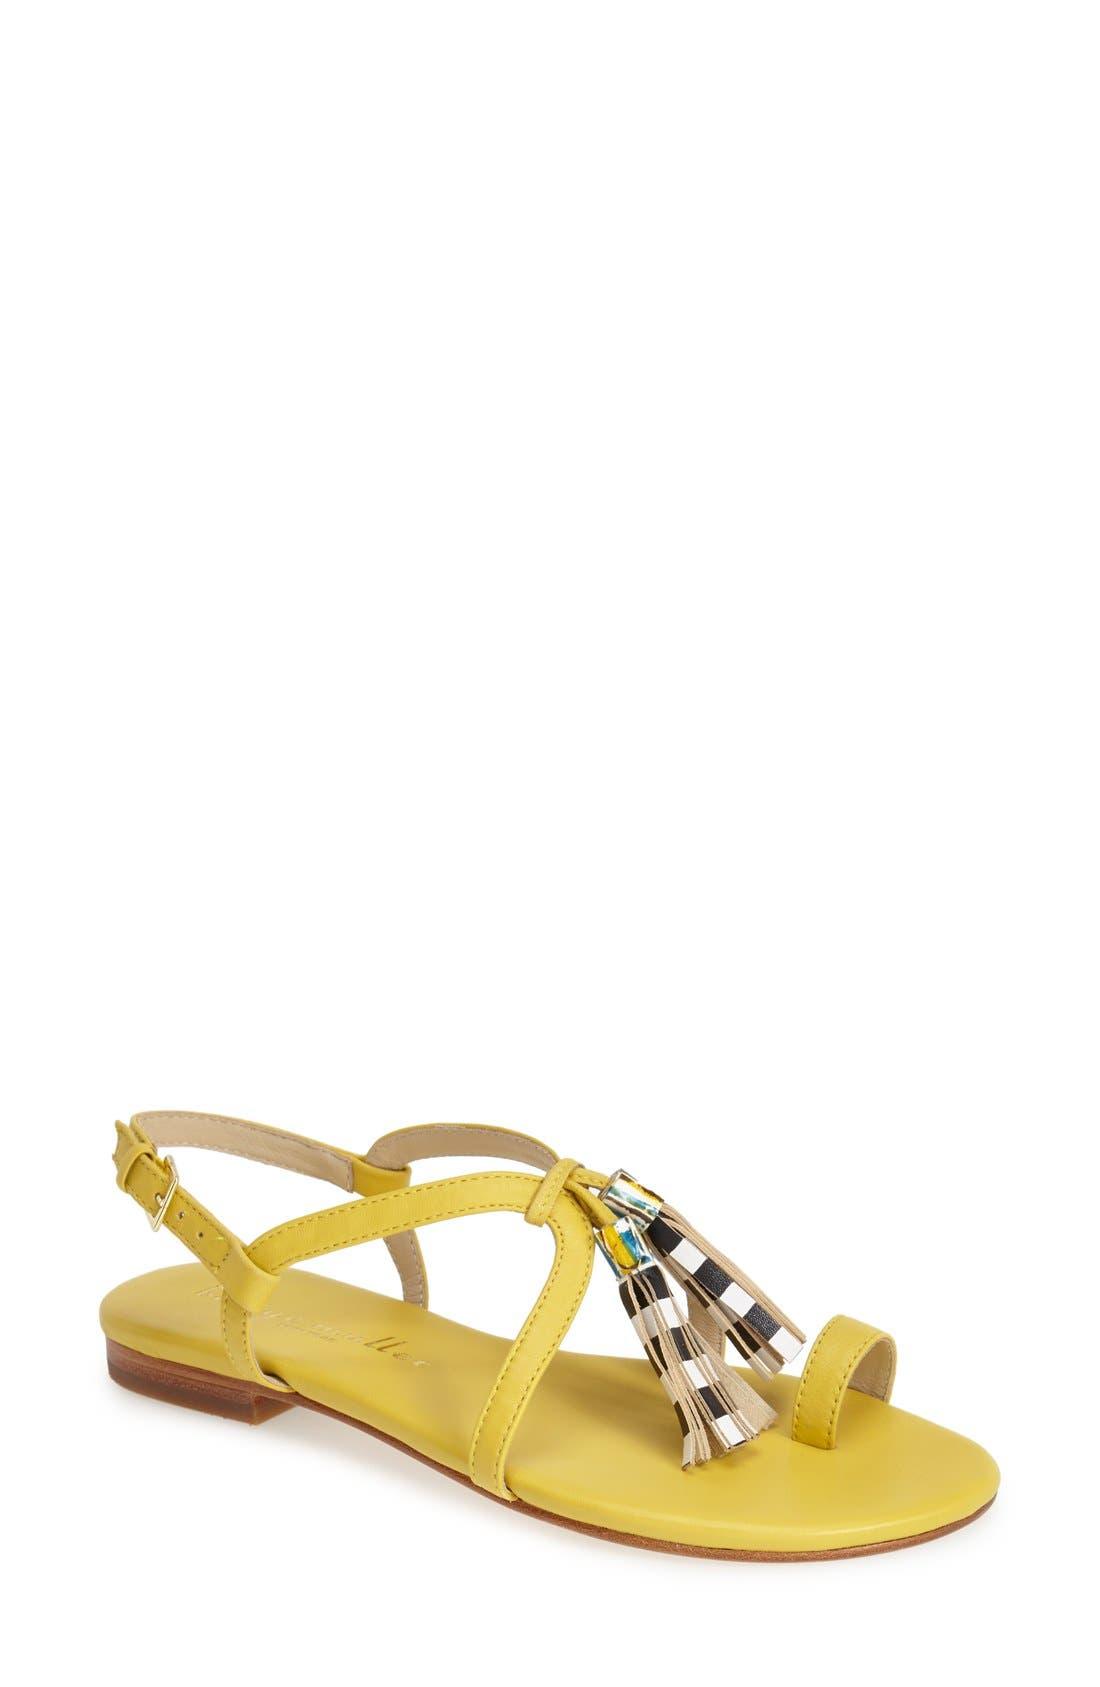 Main Image - Bettye Muller 'Sasha' Leather Tassel Sandal (Women)